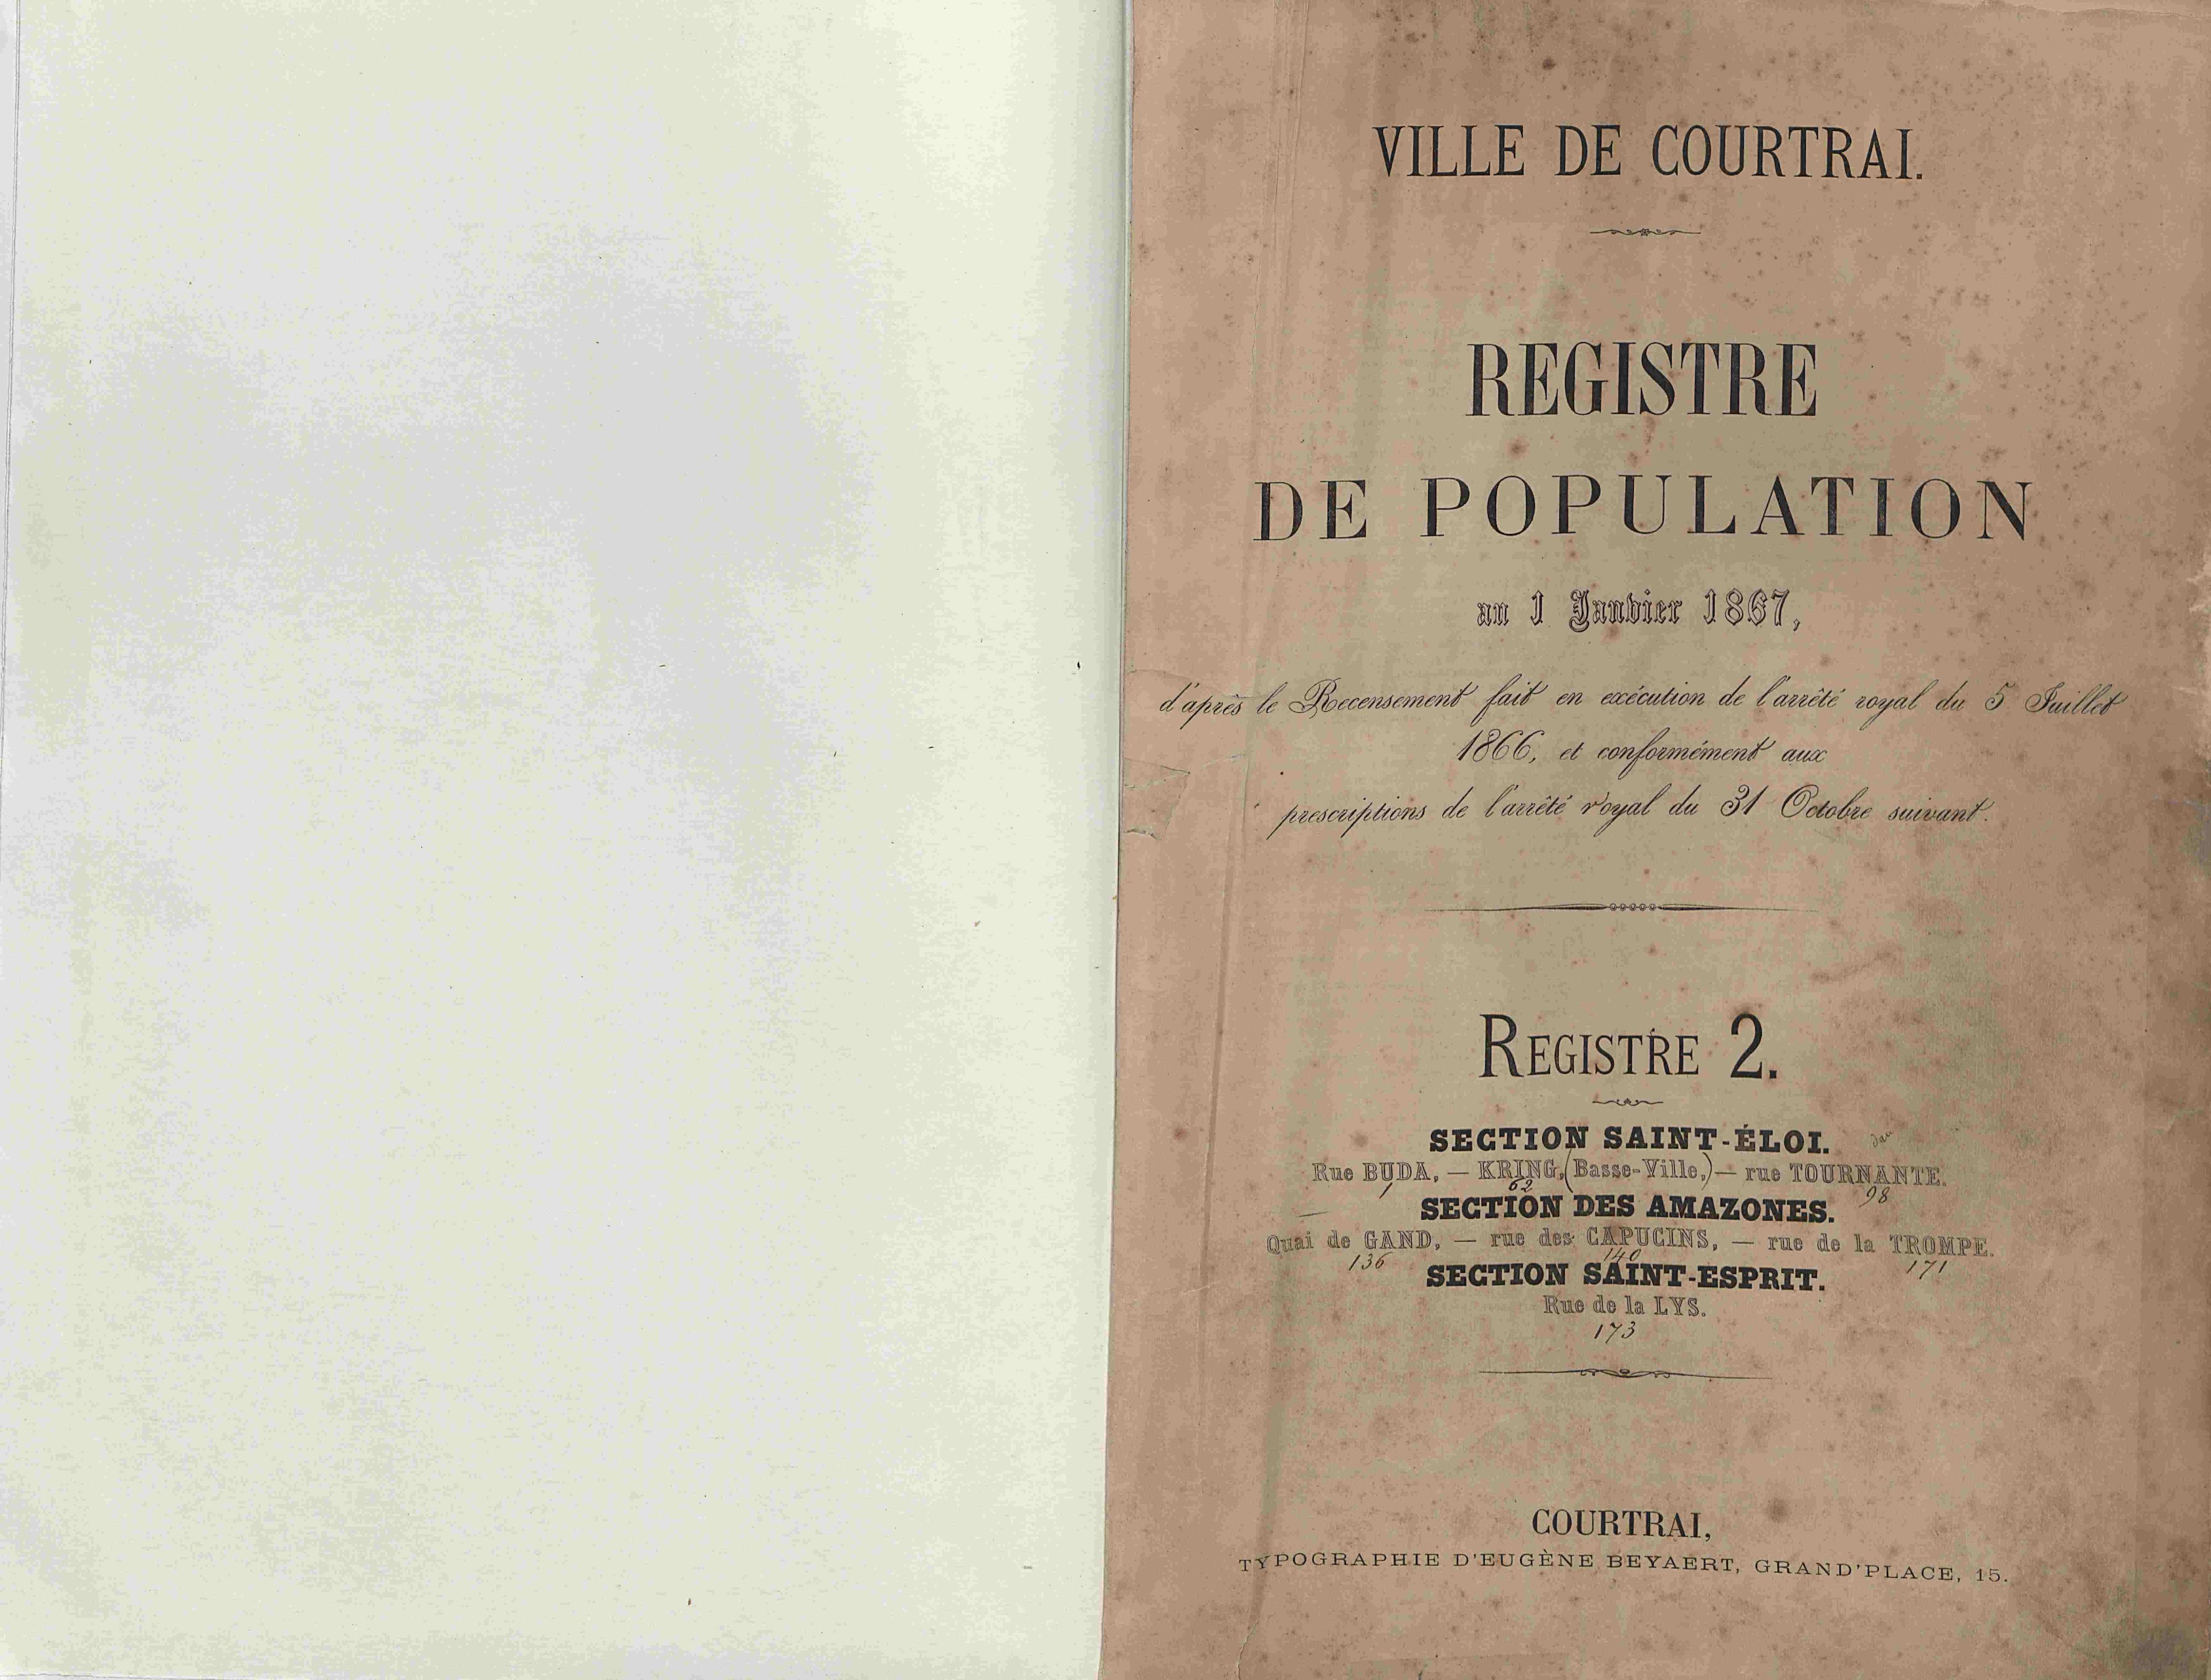 Bevolkingsregister Kortrijk 1866 boek 2